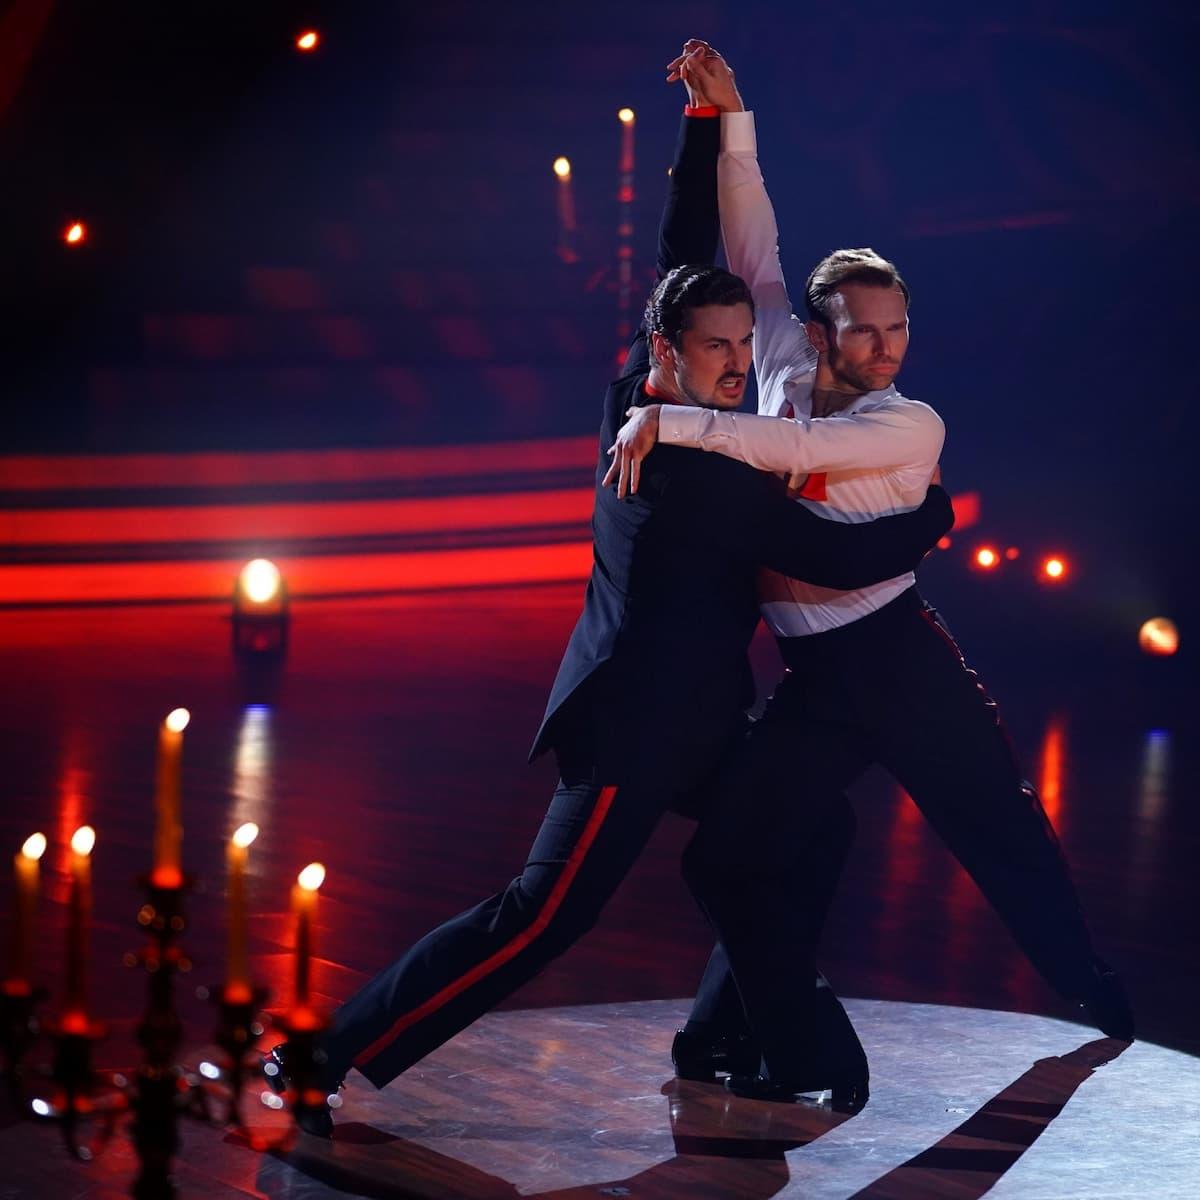 Nicolas Puschmann - Vadim Garbuzov Tango - 3. Platz im Finale Let's dance am 28.5.2021